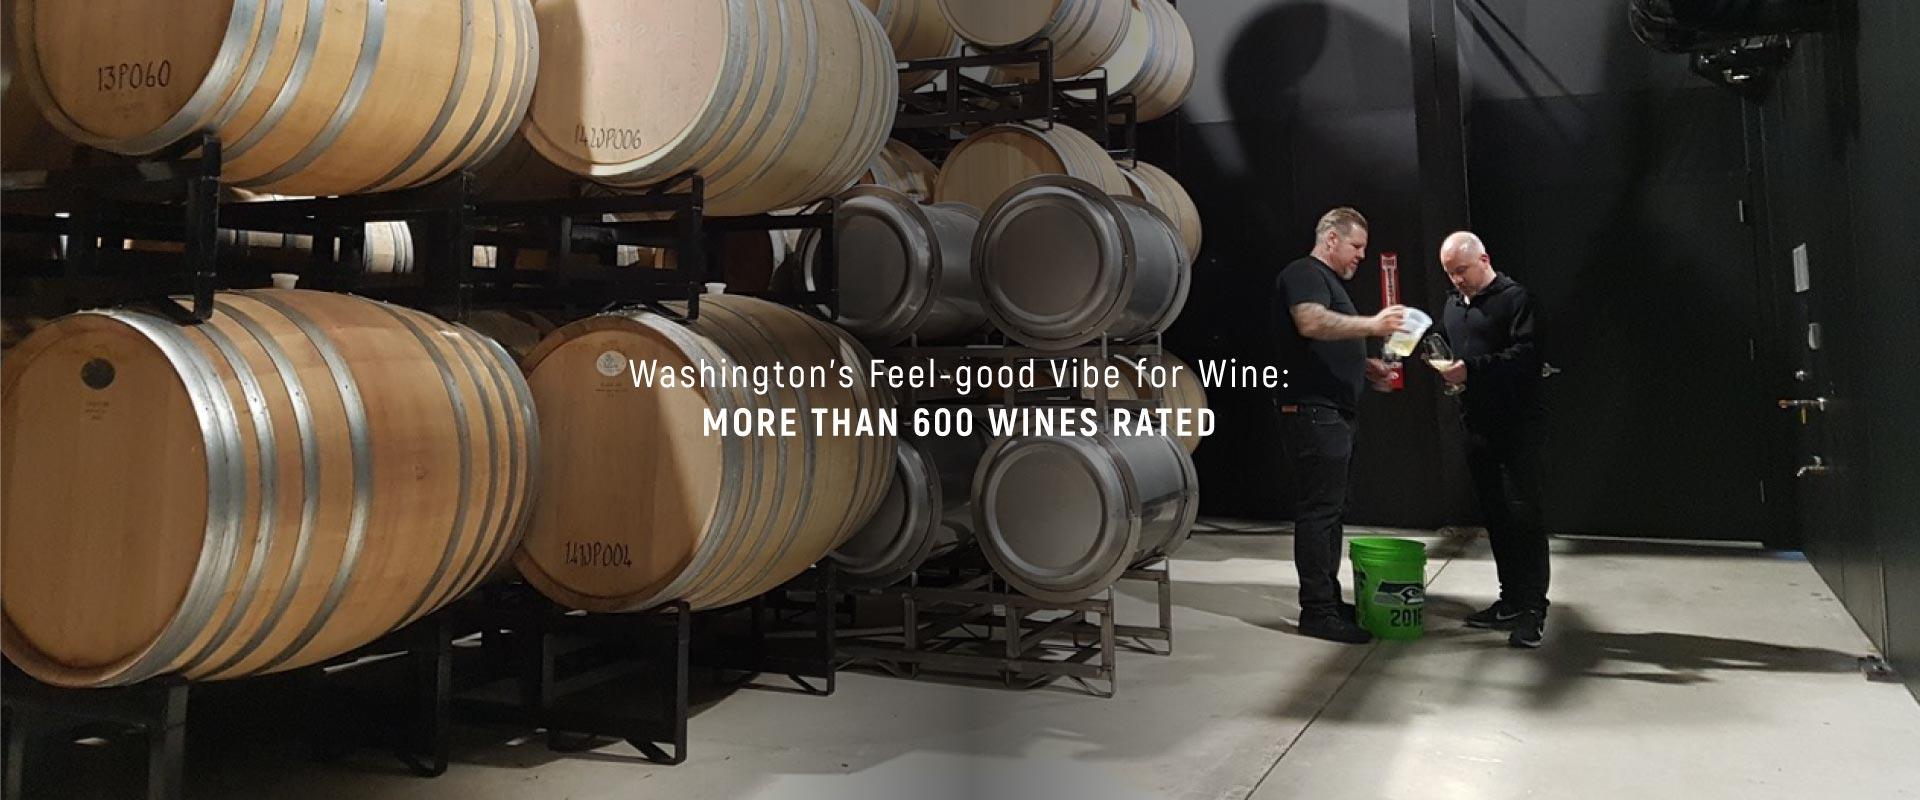 Washington's Feel-good Vibe for Wine